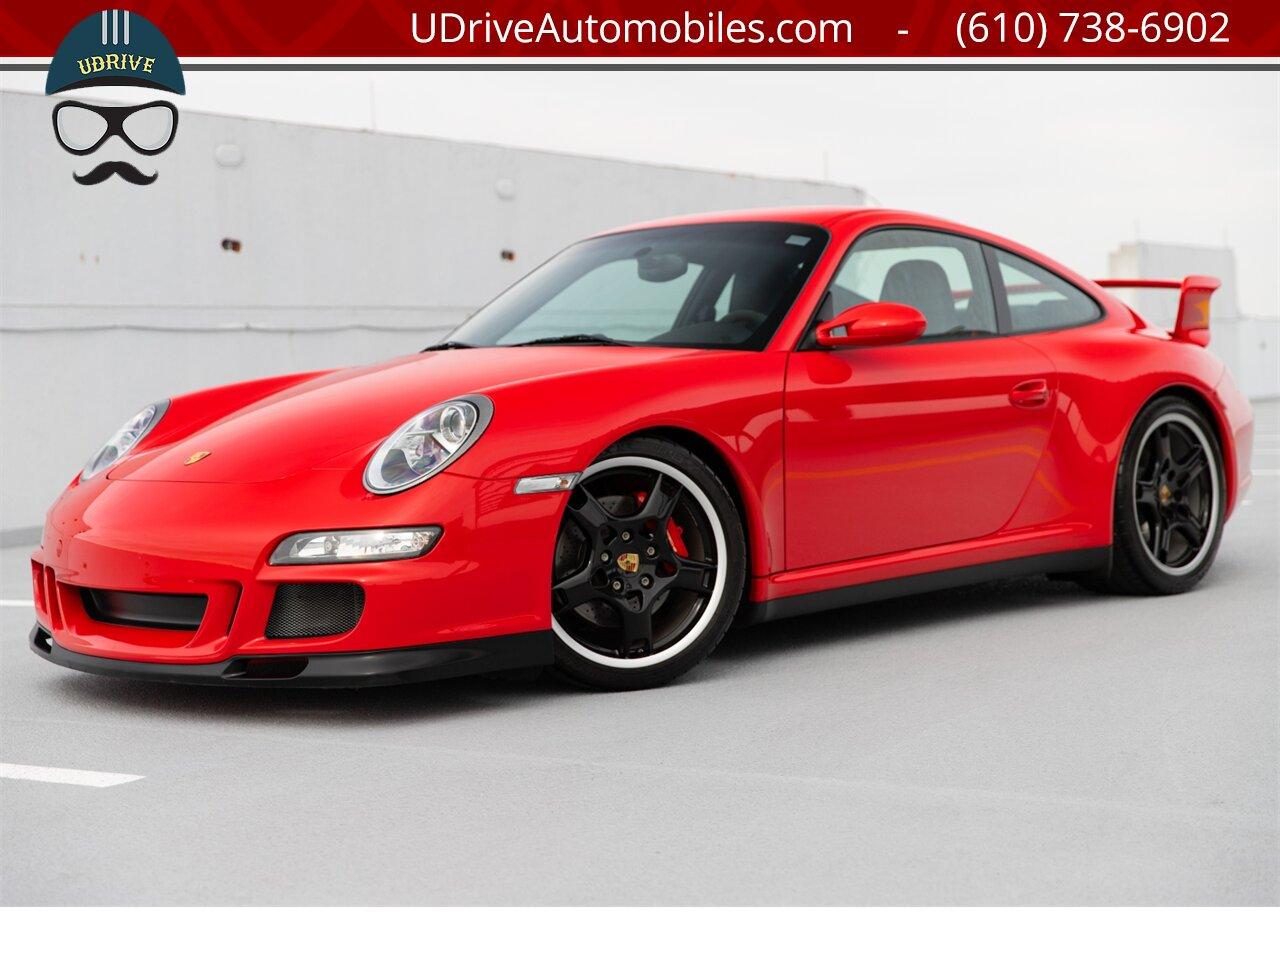 2007 Porsche 911 C4s 6 Speed Aerokit 1 Of A Kind Factory Options